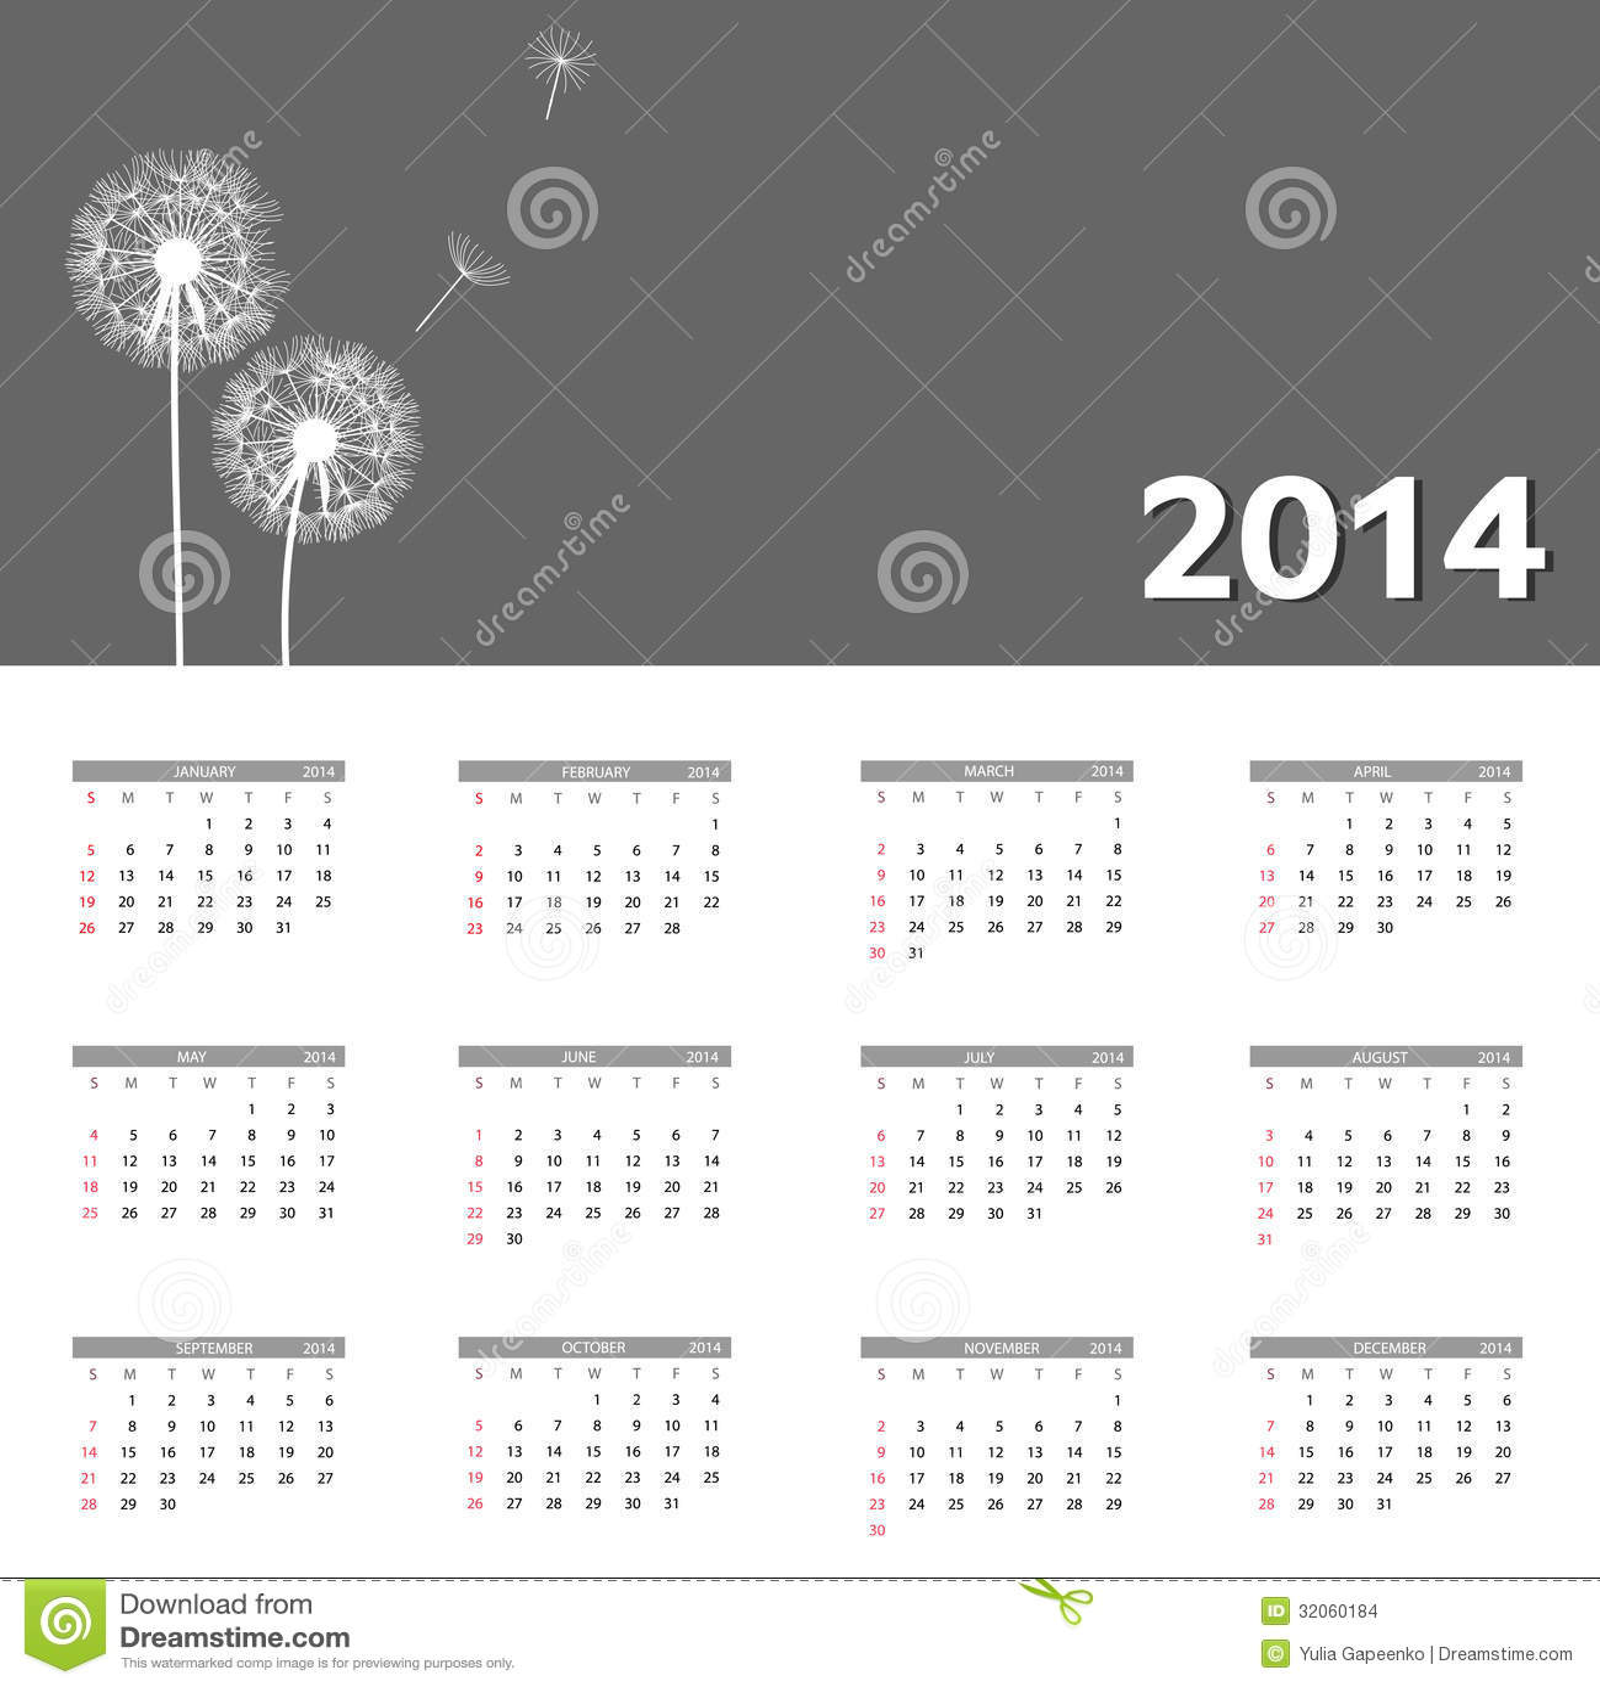 Kalendervektorillustration des neuen Jahres 2014